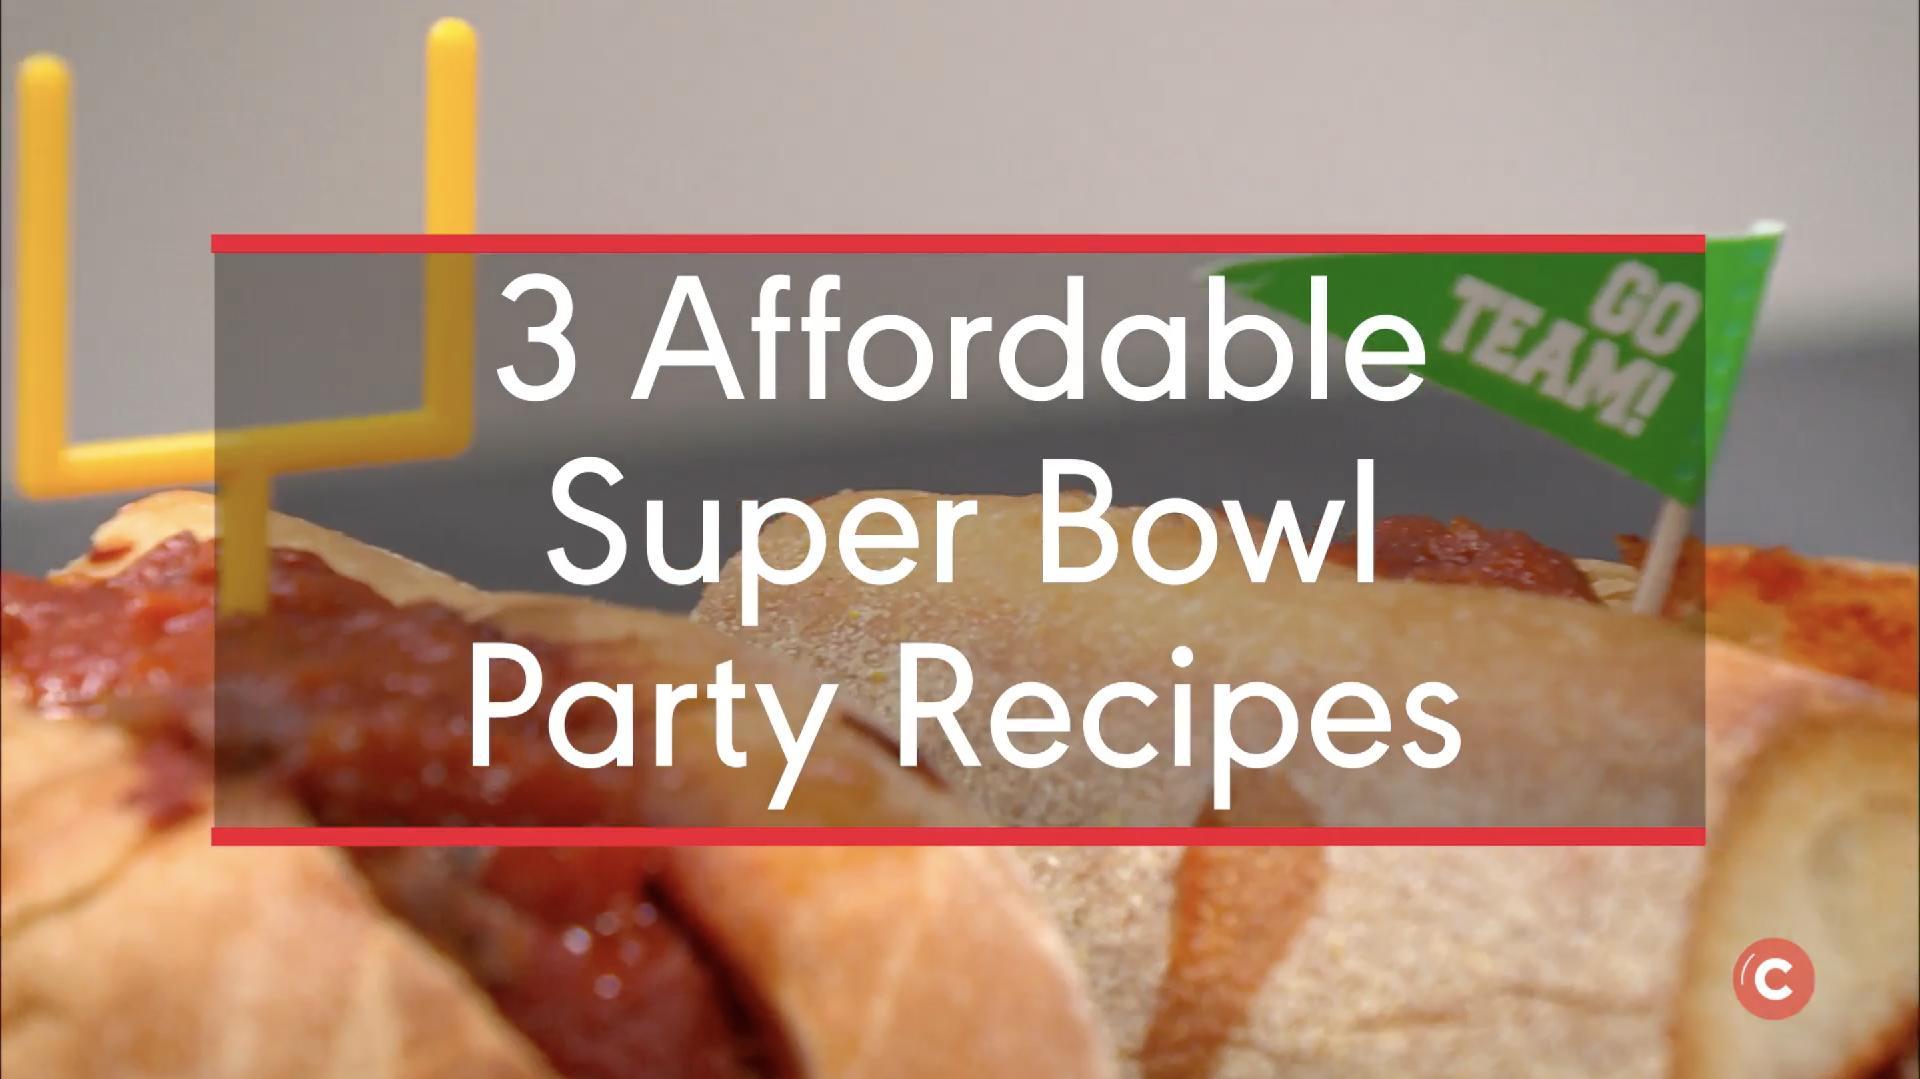 3 Affordable Super Bowl Party Recipes